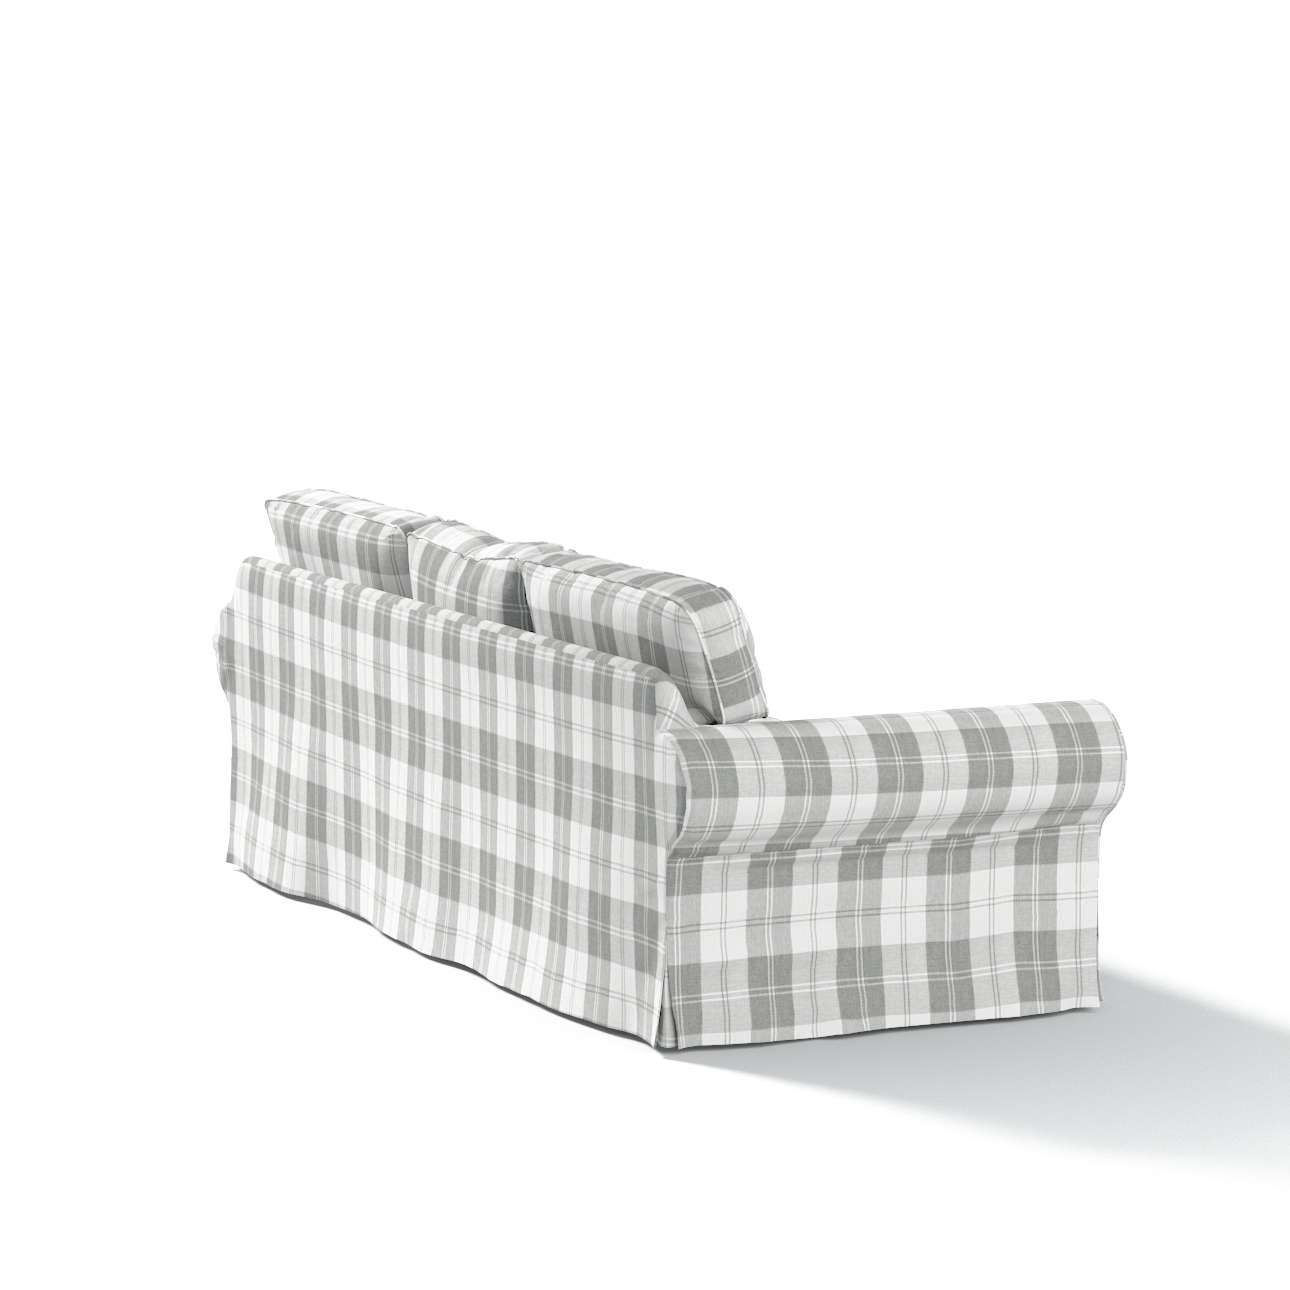 Ektorp 3-Sitzer Schlafsofabezug, ALTES Modell Sofahusse Ektorp 3-Sitzer Schlafsofa von der Kollektion Edinburgh , Stoff: 115-79